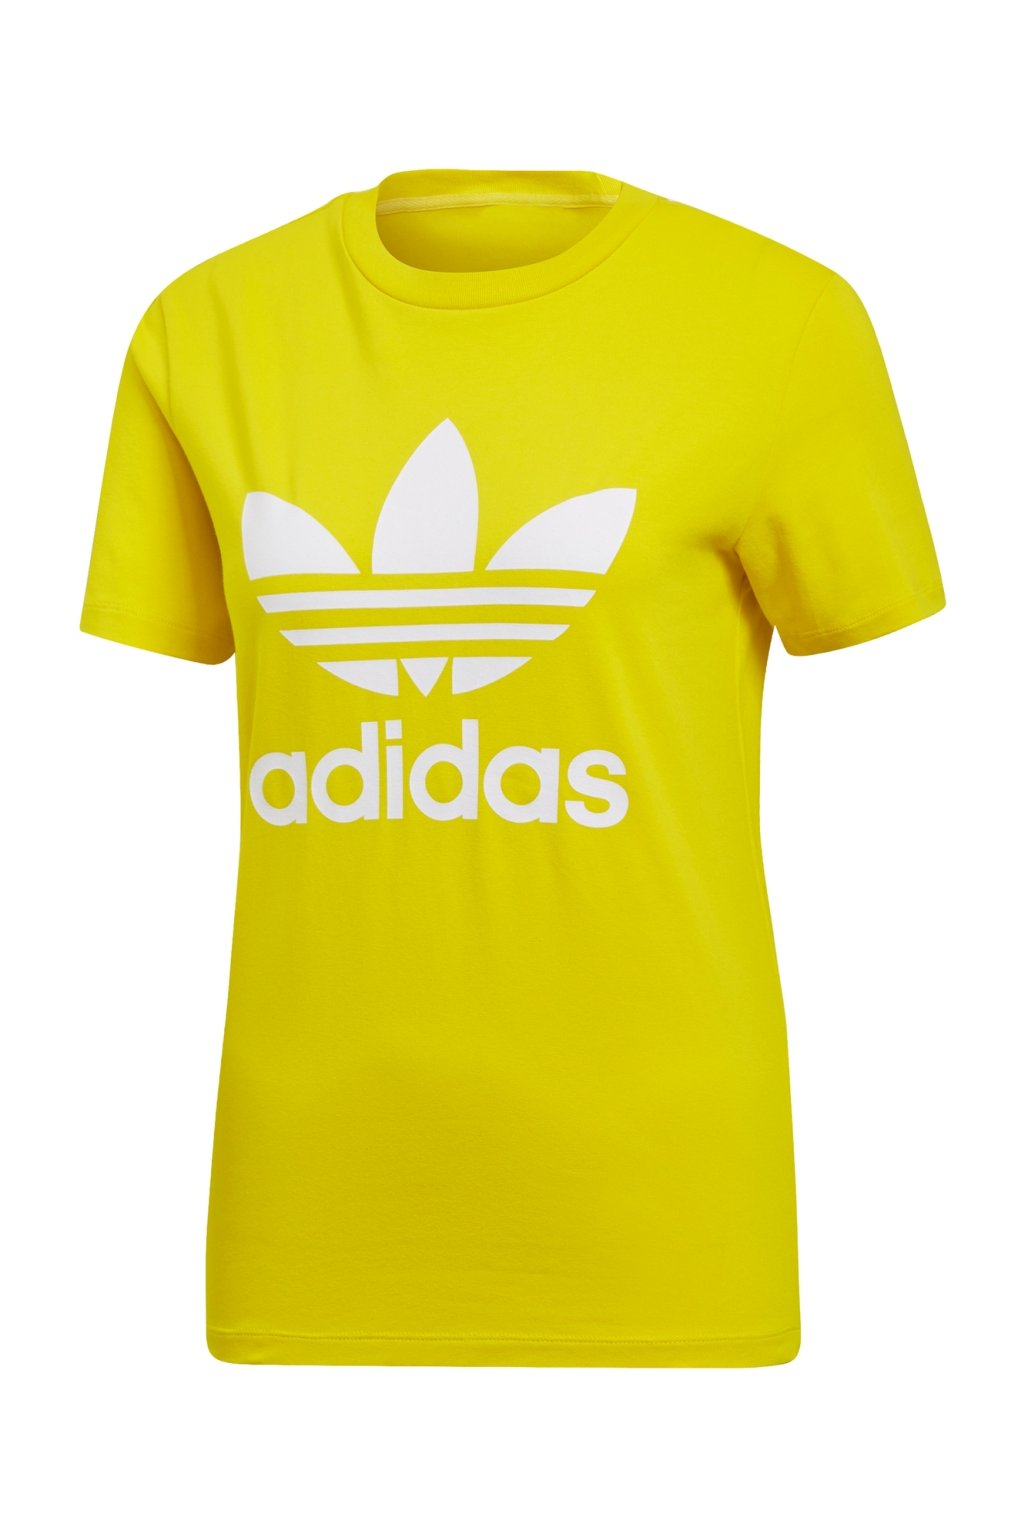 Adidas Originals dámske tričko ED7495